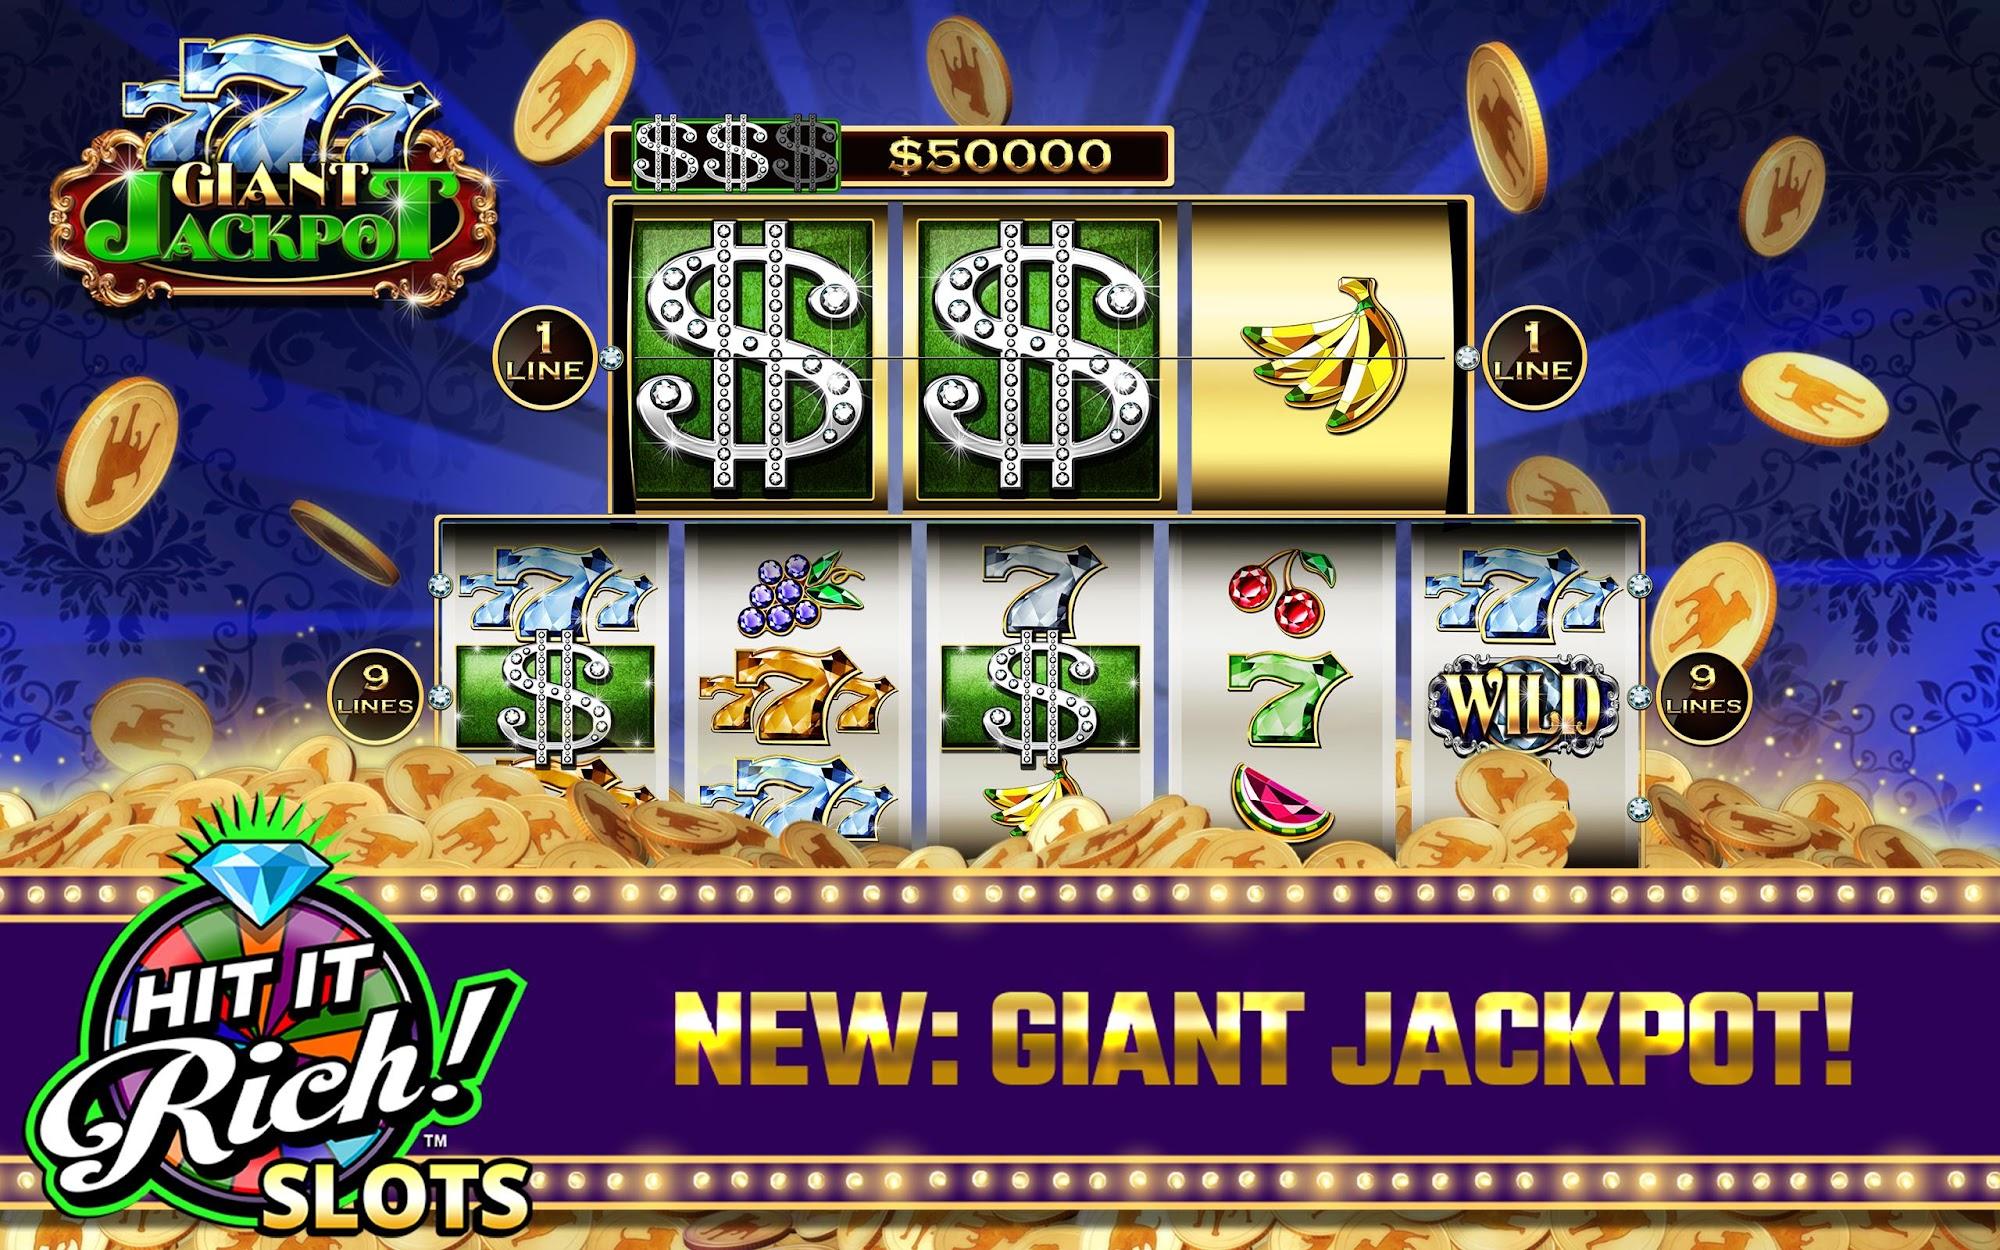 Hit it Rich! Free Casino Slots screenshot #9